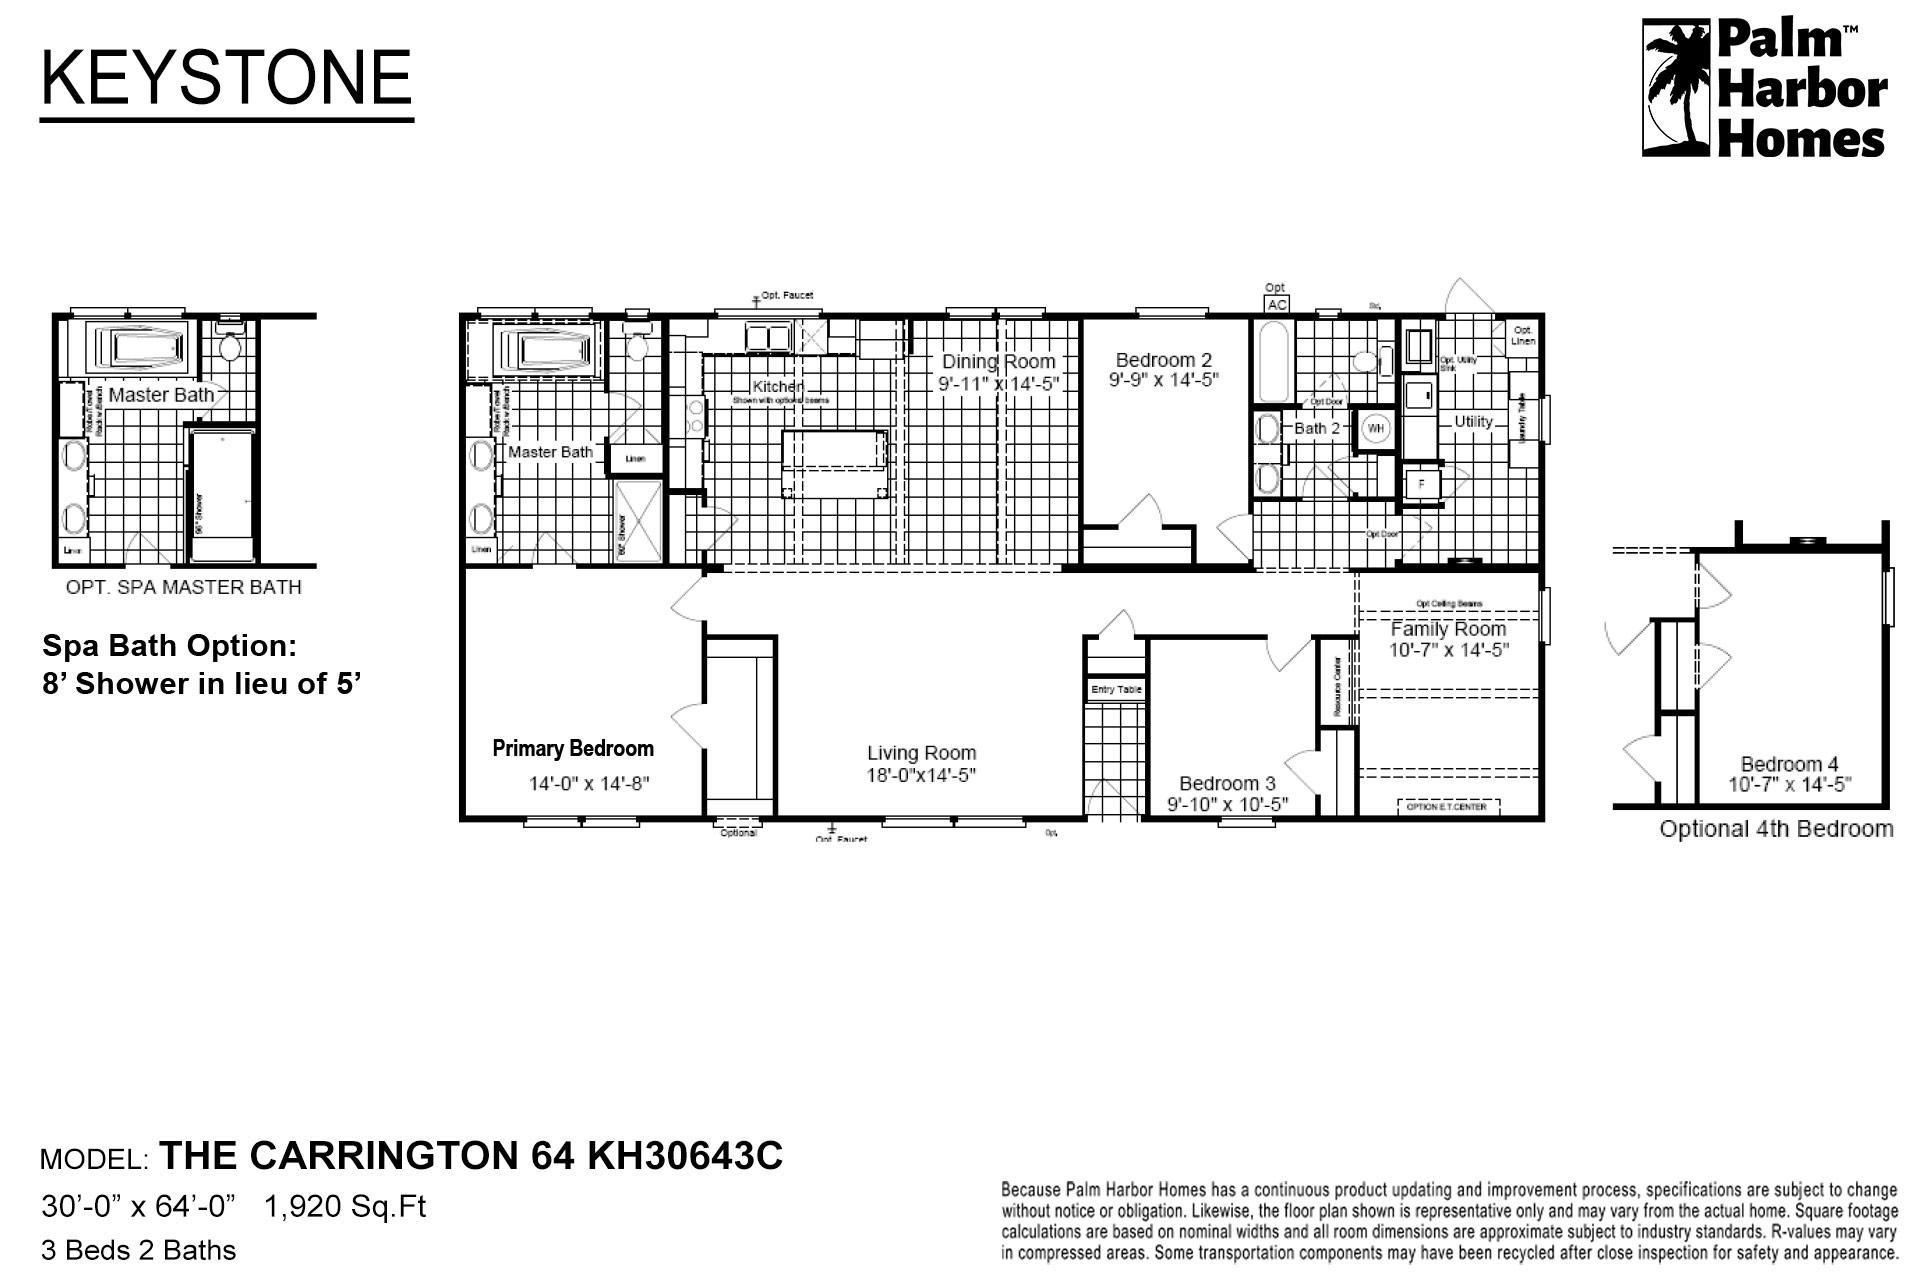 Keystone The Carrington 64 KH30643C Layout